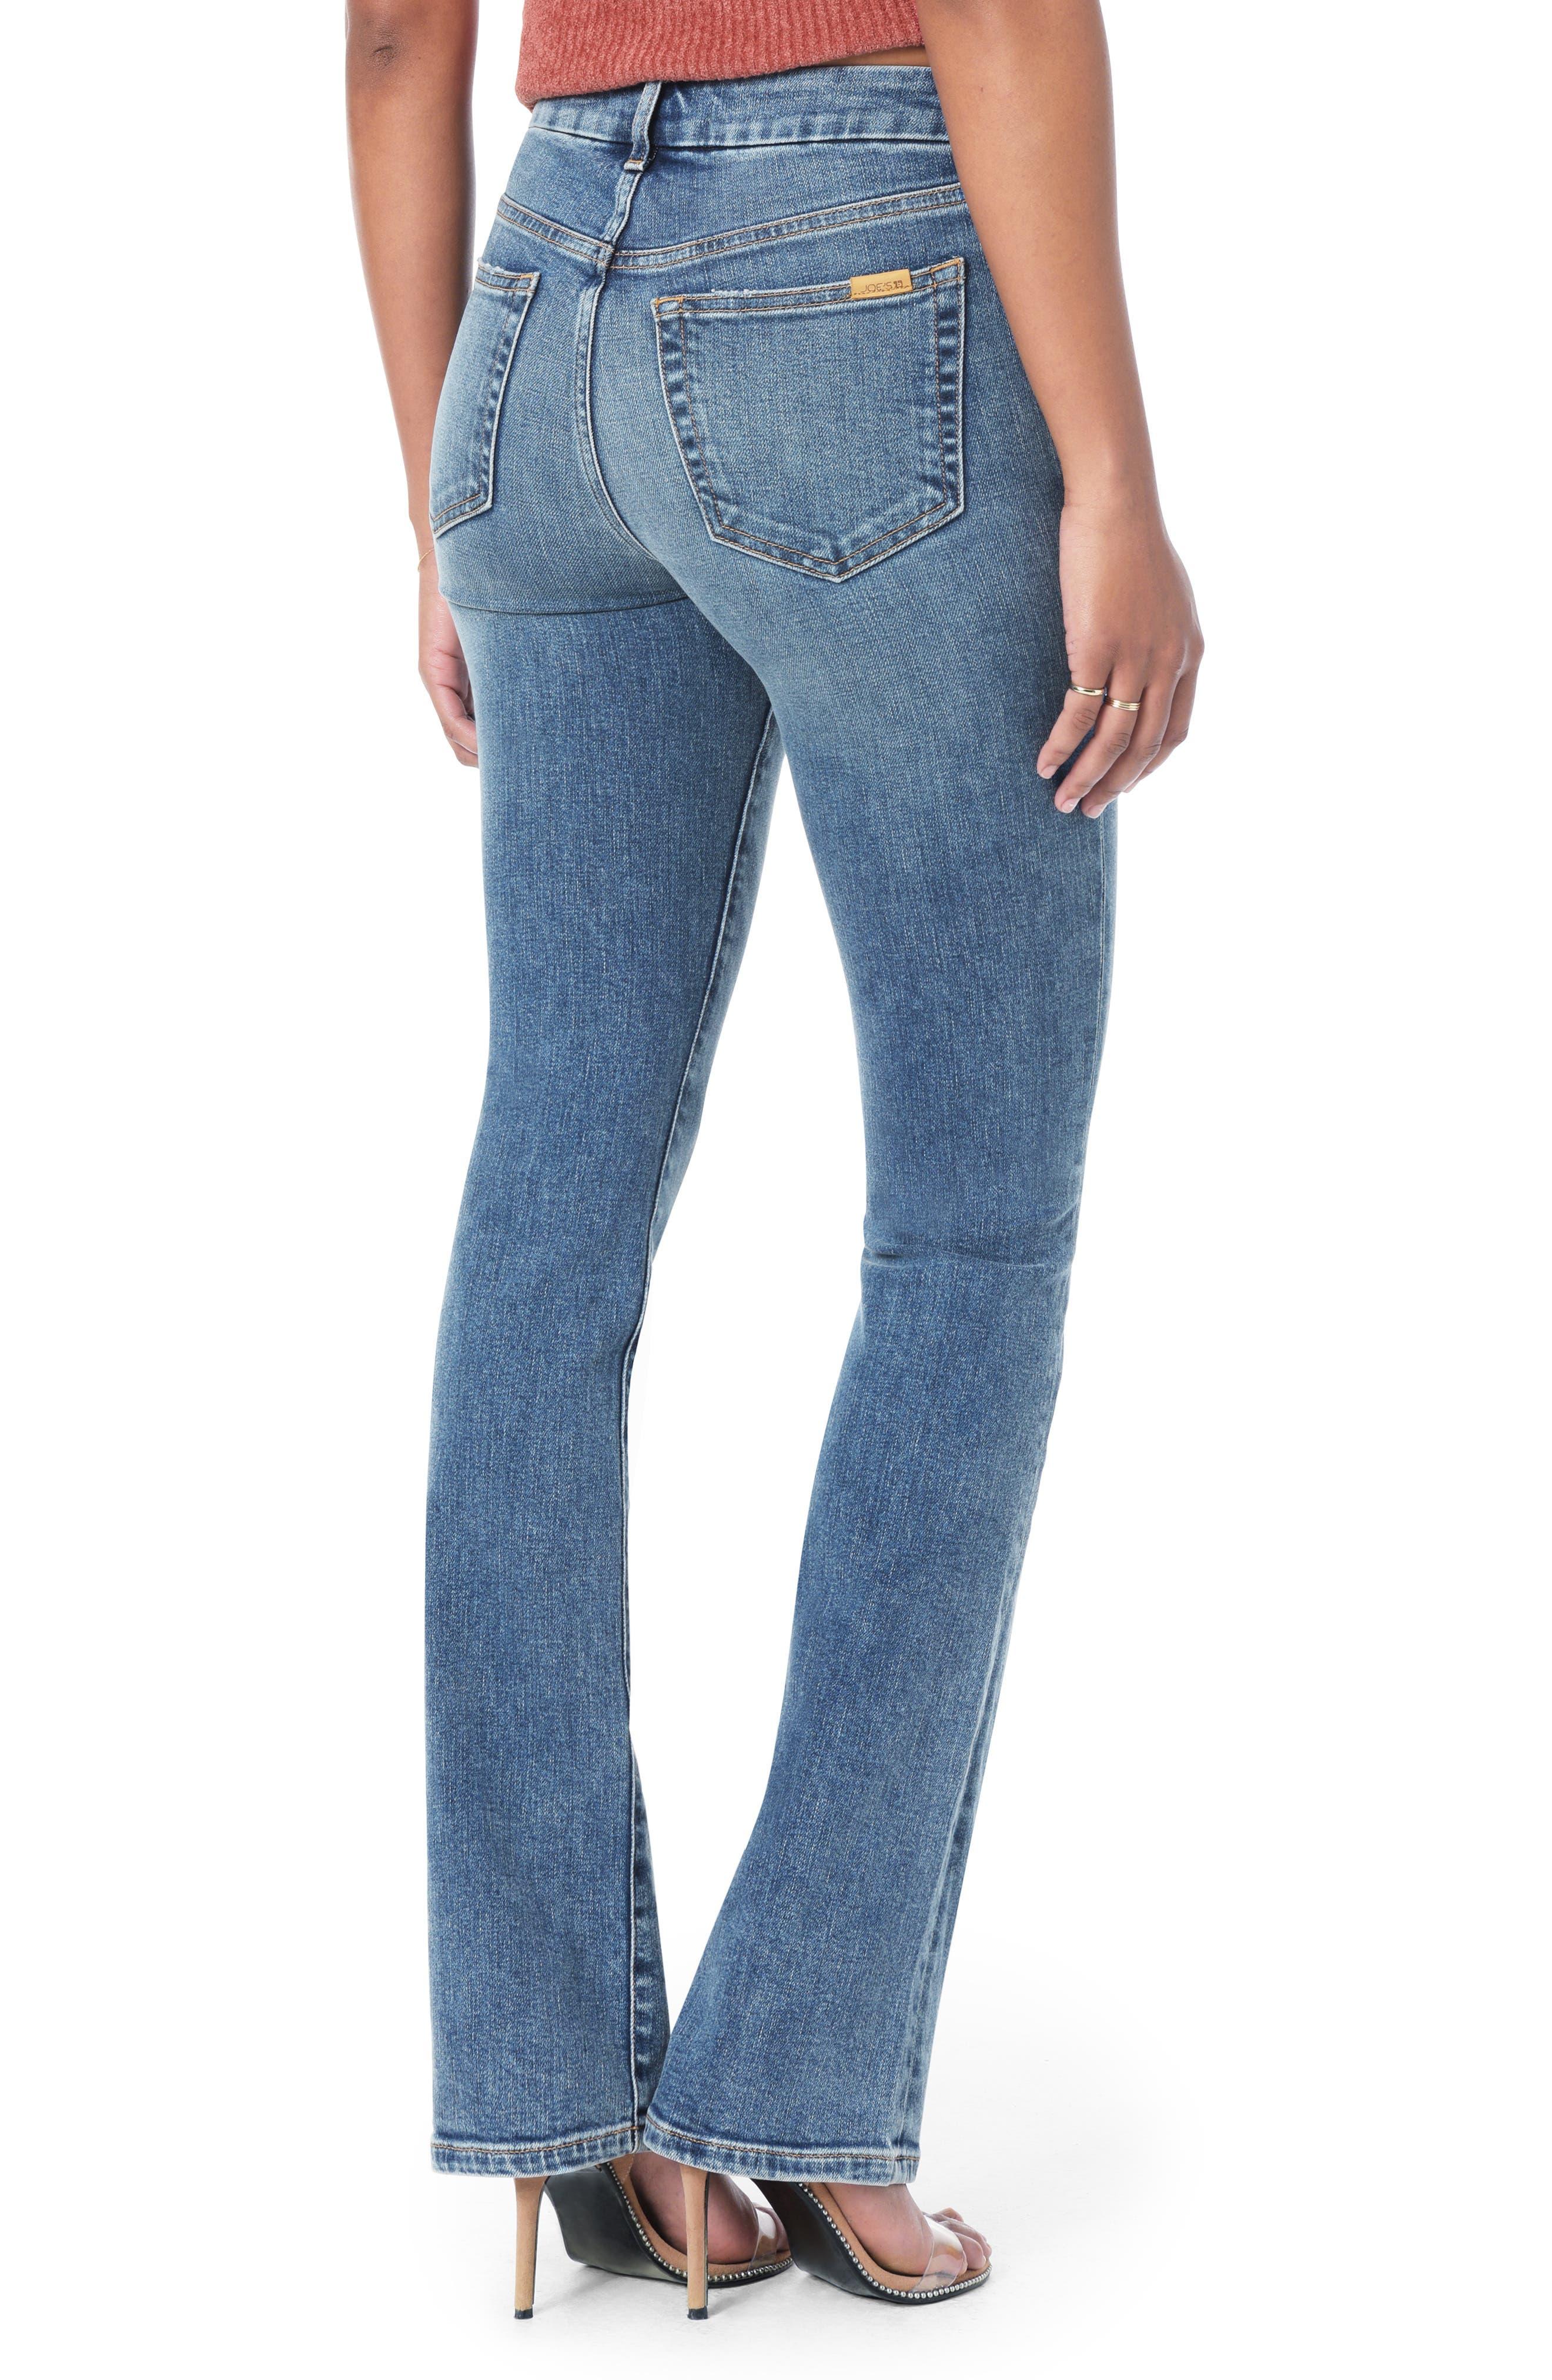 Honey Curvy High Waist Bootcut Jeans,                             Alternate thumbnail 2, color,                             CHRISELLE